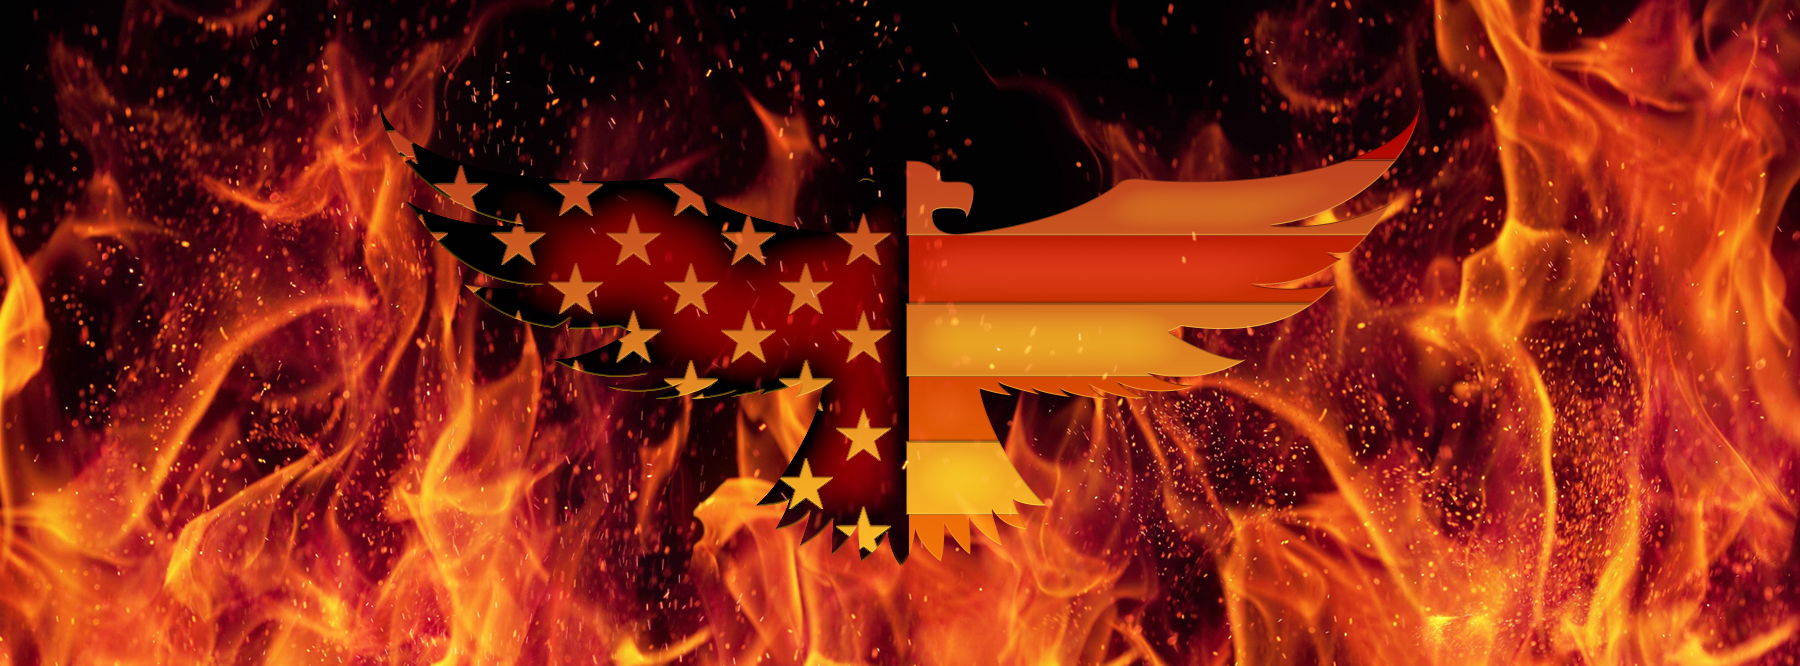 FB header flames.jpg